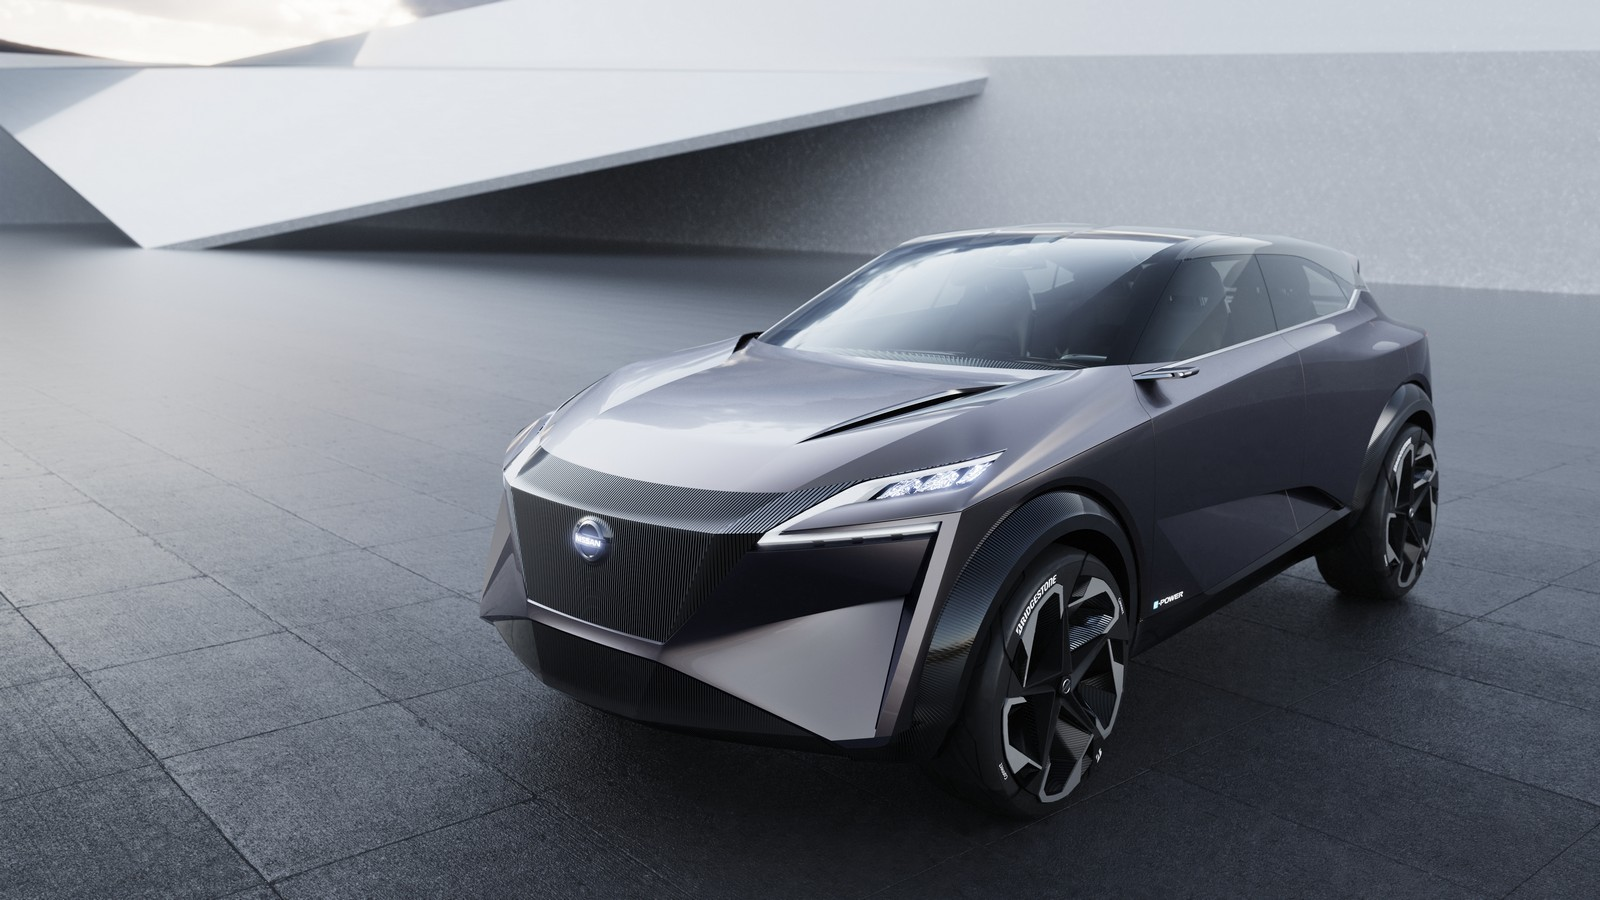 Nissan Imq Concept Car Ginebra (2)